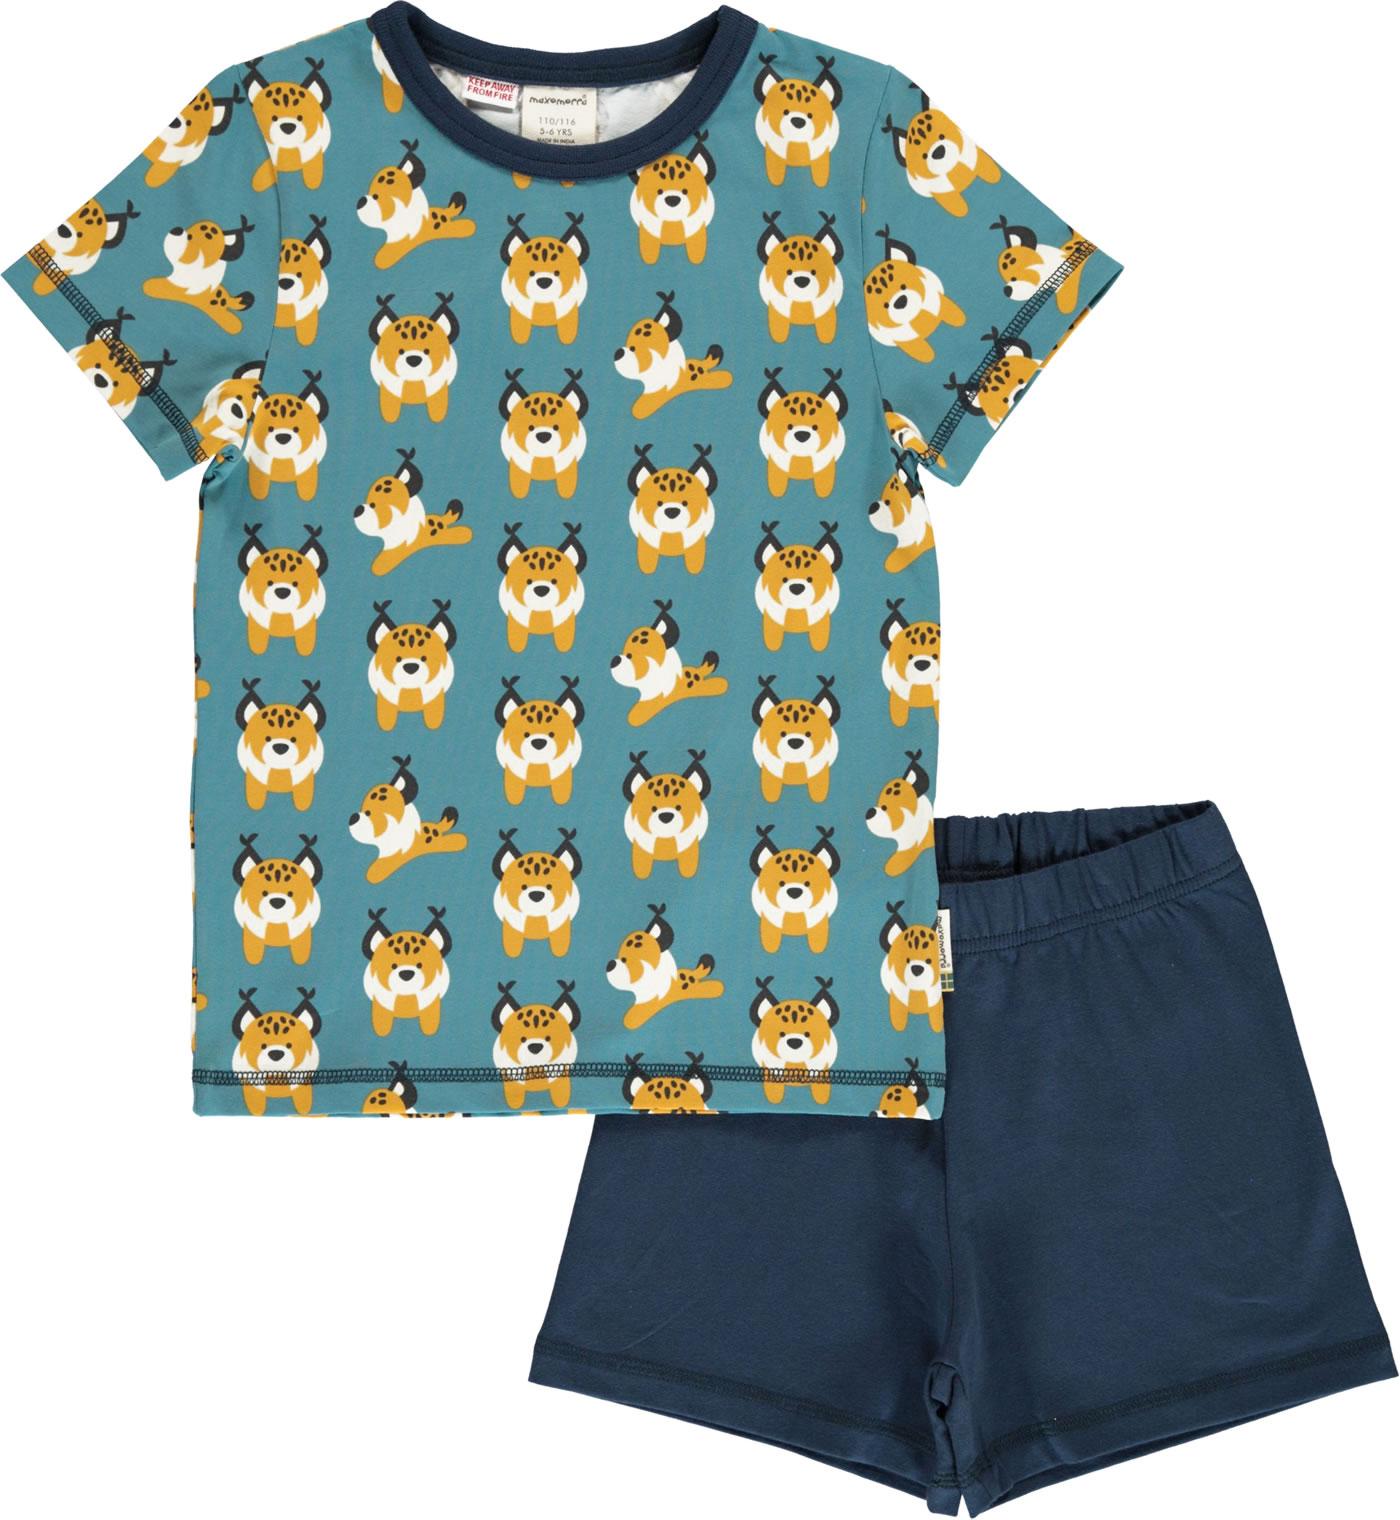 Maxomorra Pyjama Schlafanzug Kurz LUCHS Blau M439-D3274